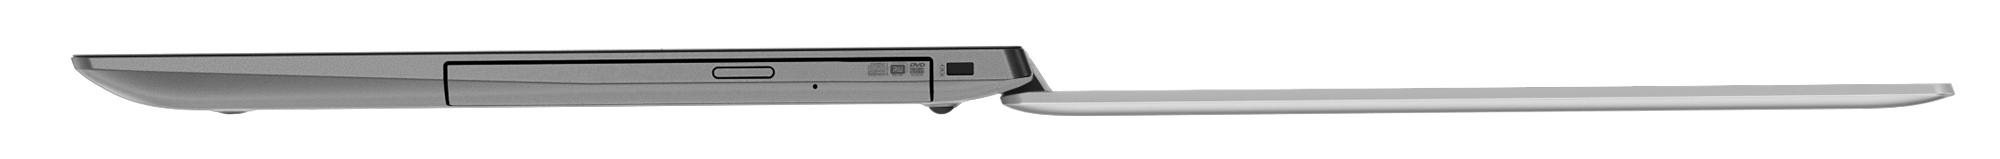 Фото  Ноутбук Lenovo ideapad 330-15 Platinum Grey (81DC00RSRA)